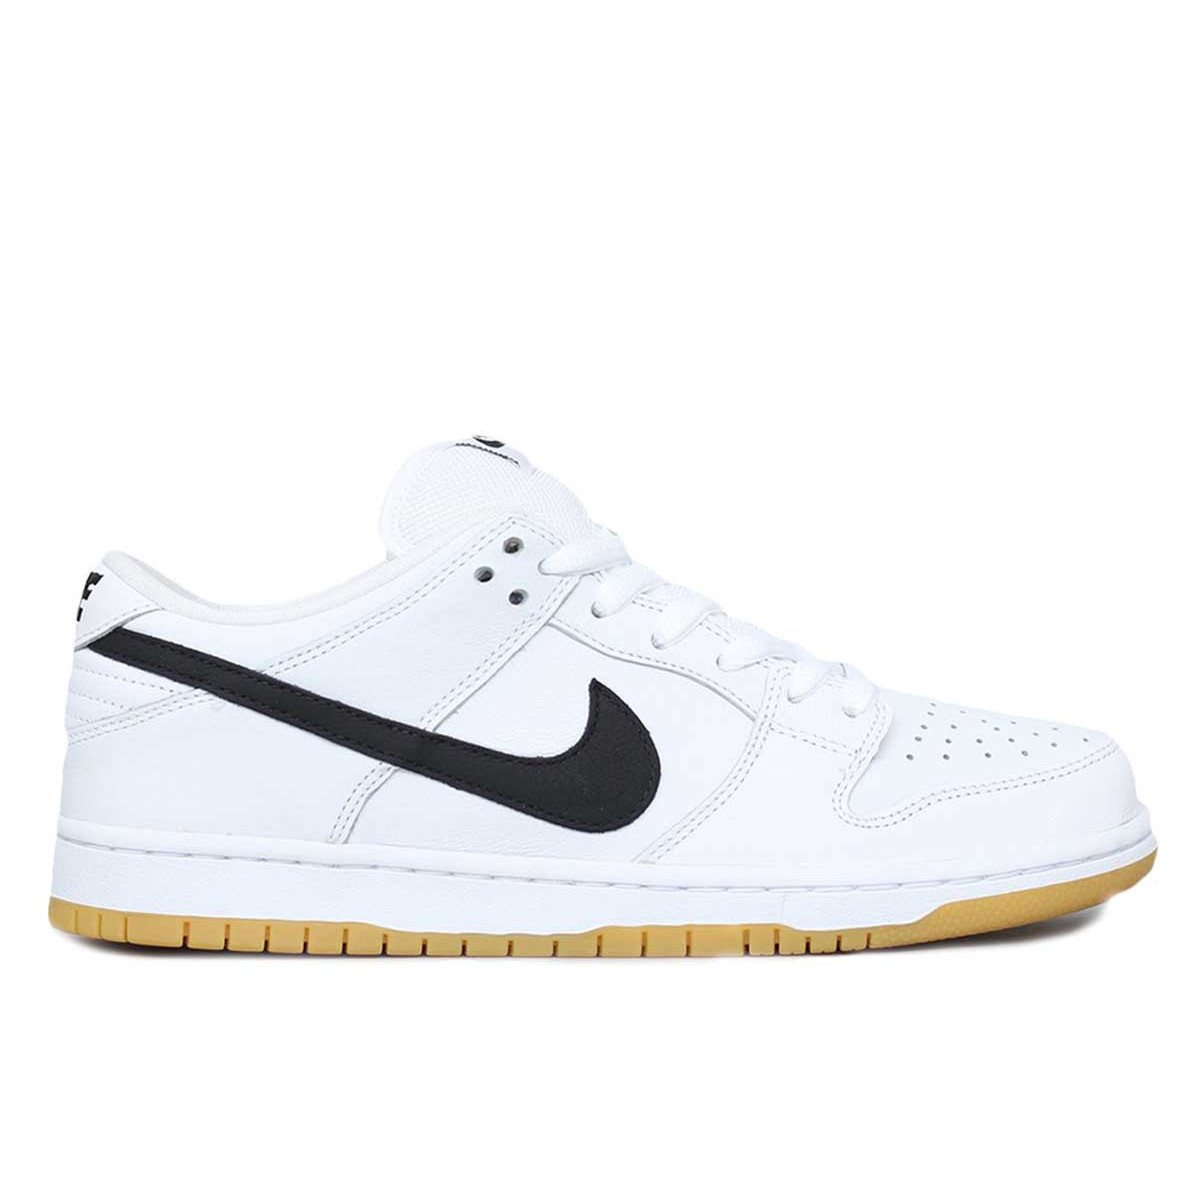 the best attitude 55074 926c0 Nike SB Dunk Low Pro Shoes (ISO) - Shredz Shop